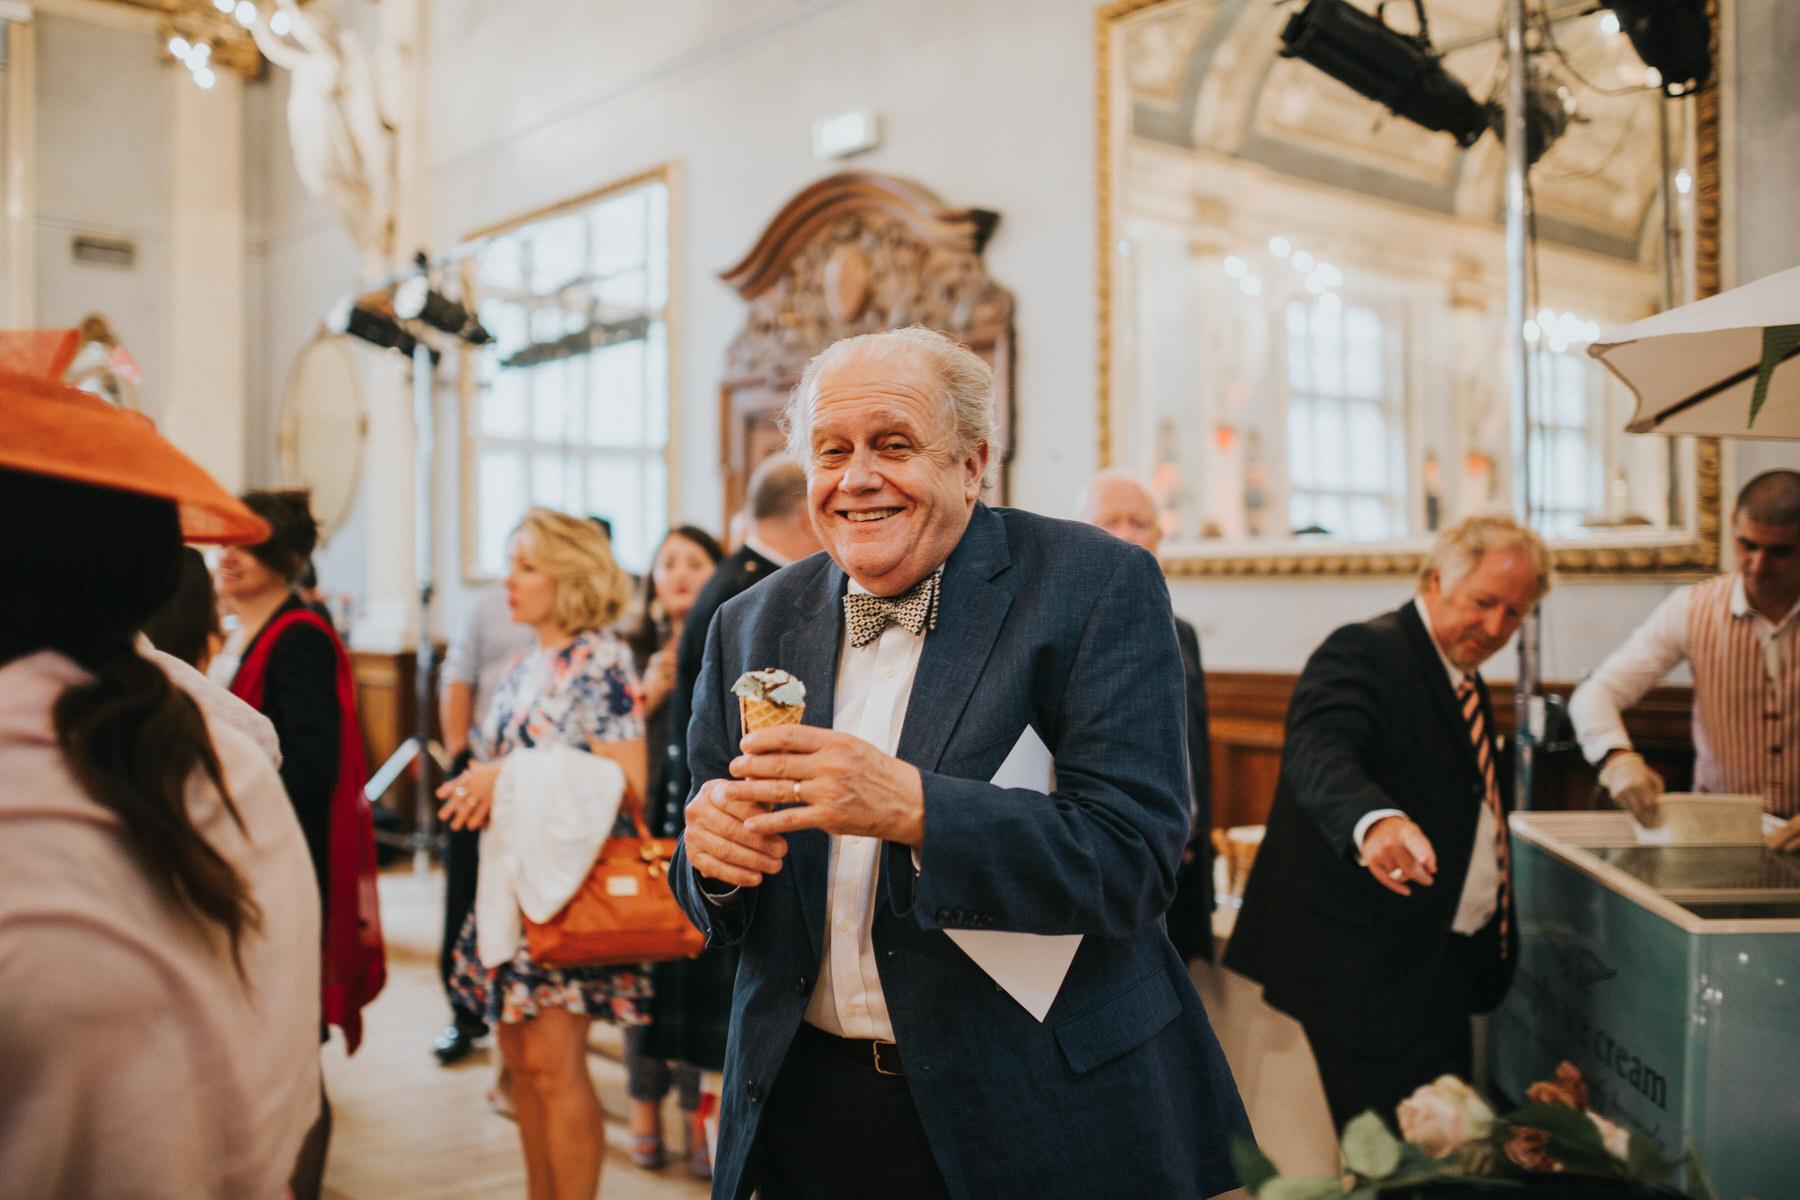 256 Old Finsbury Town Hall wedding guest eating icecream.jpg